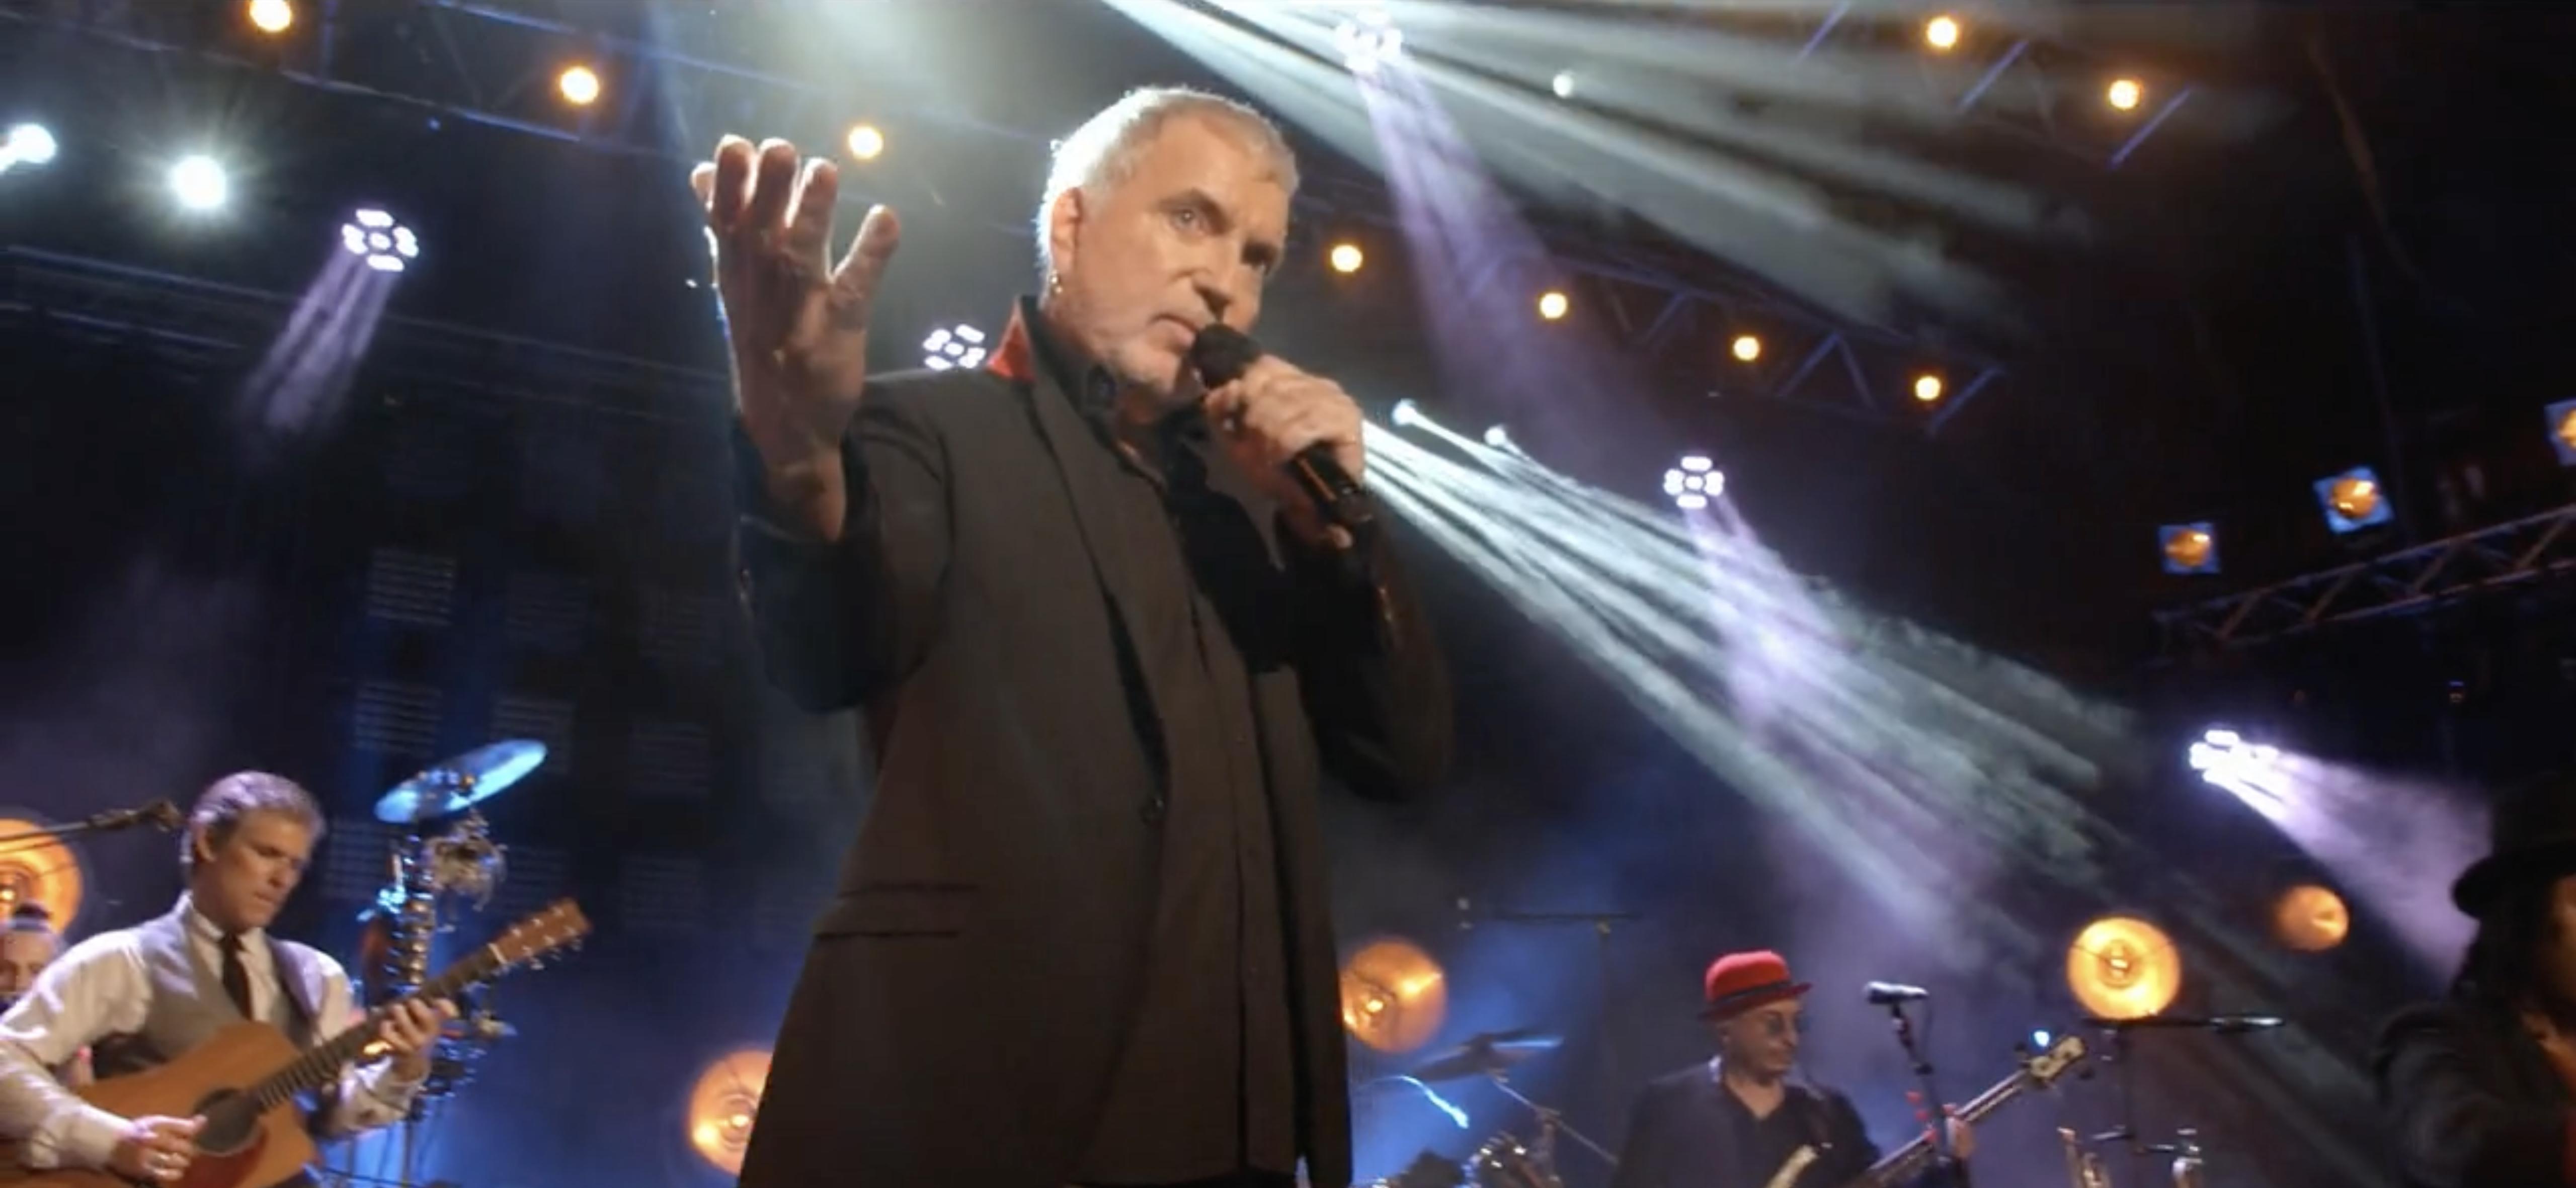 concerts bernard lavilliers 2018